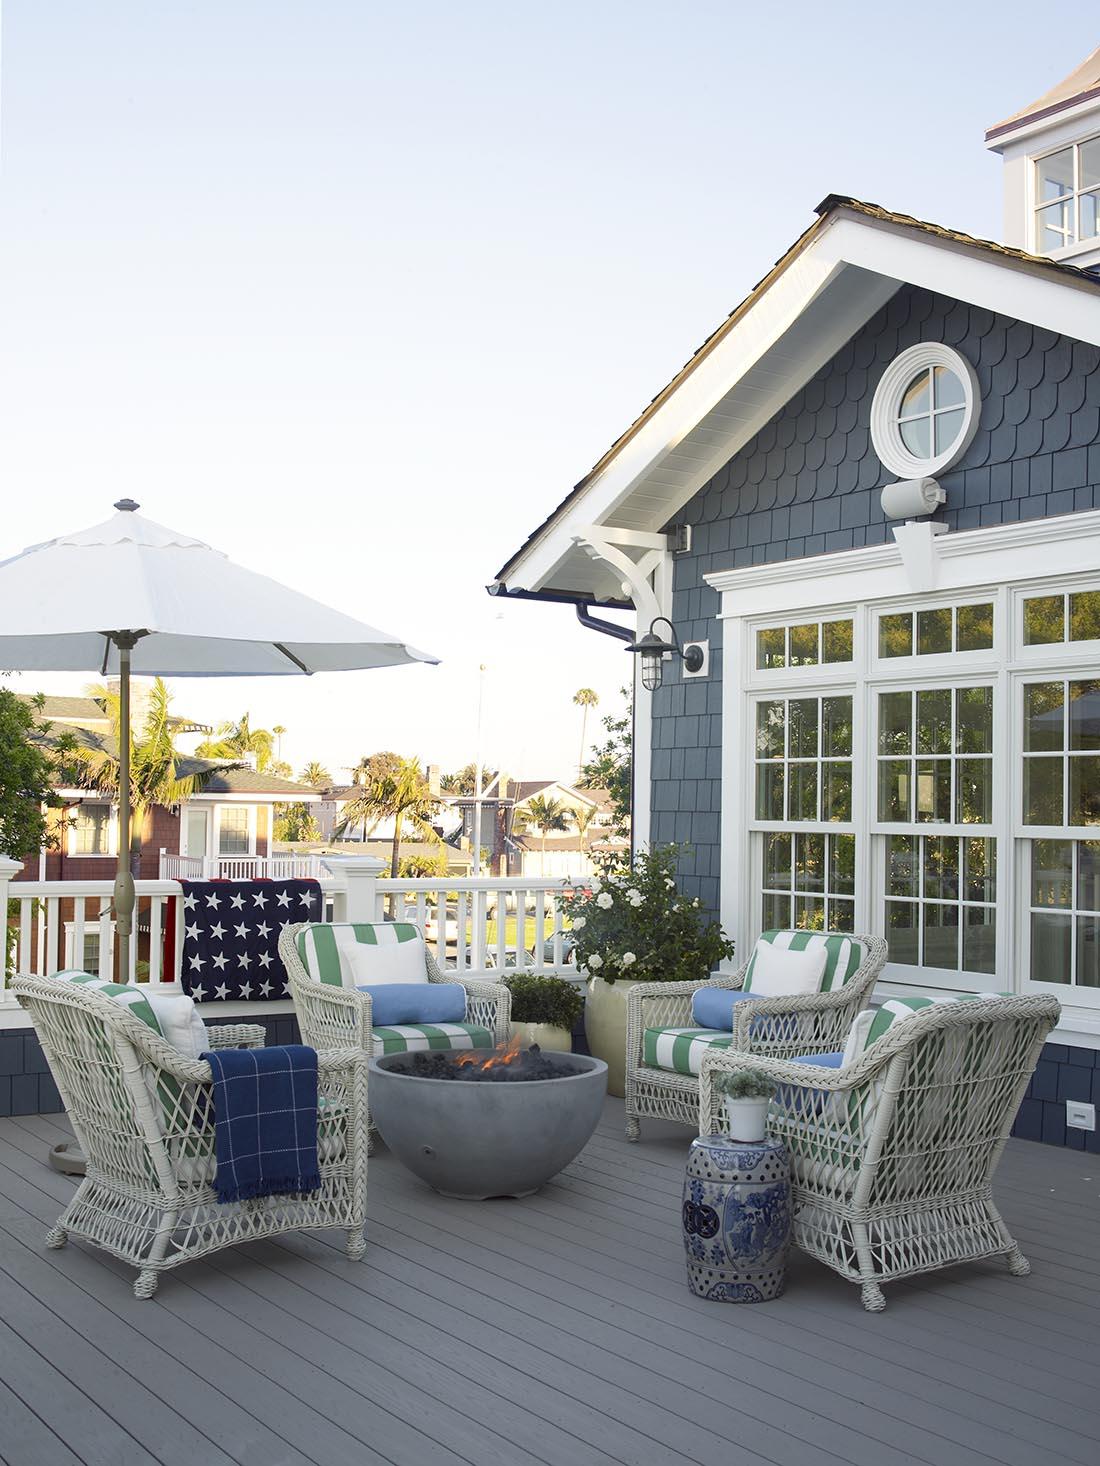 Blue Siding on Coastal Home - Back Patio for Summer